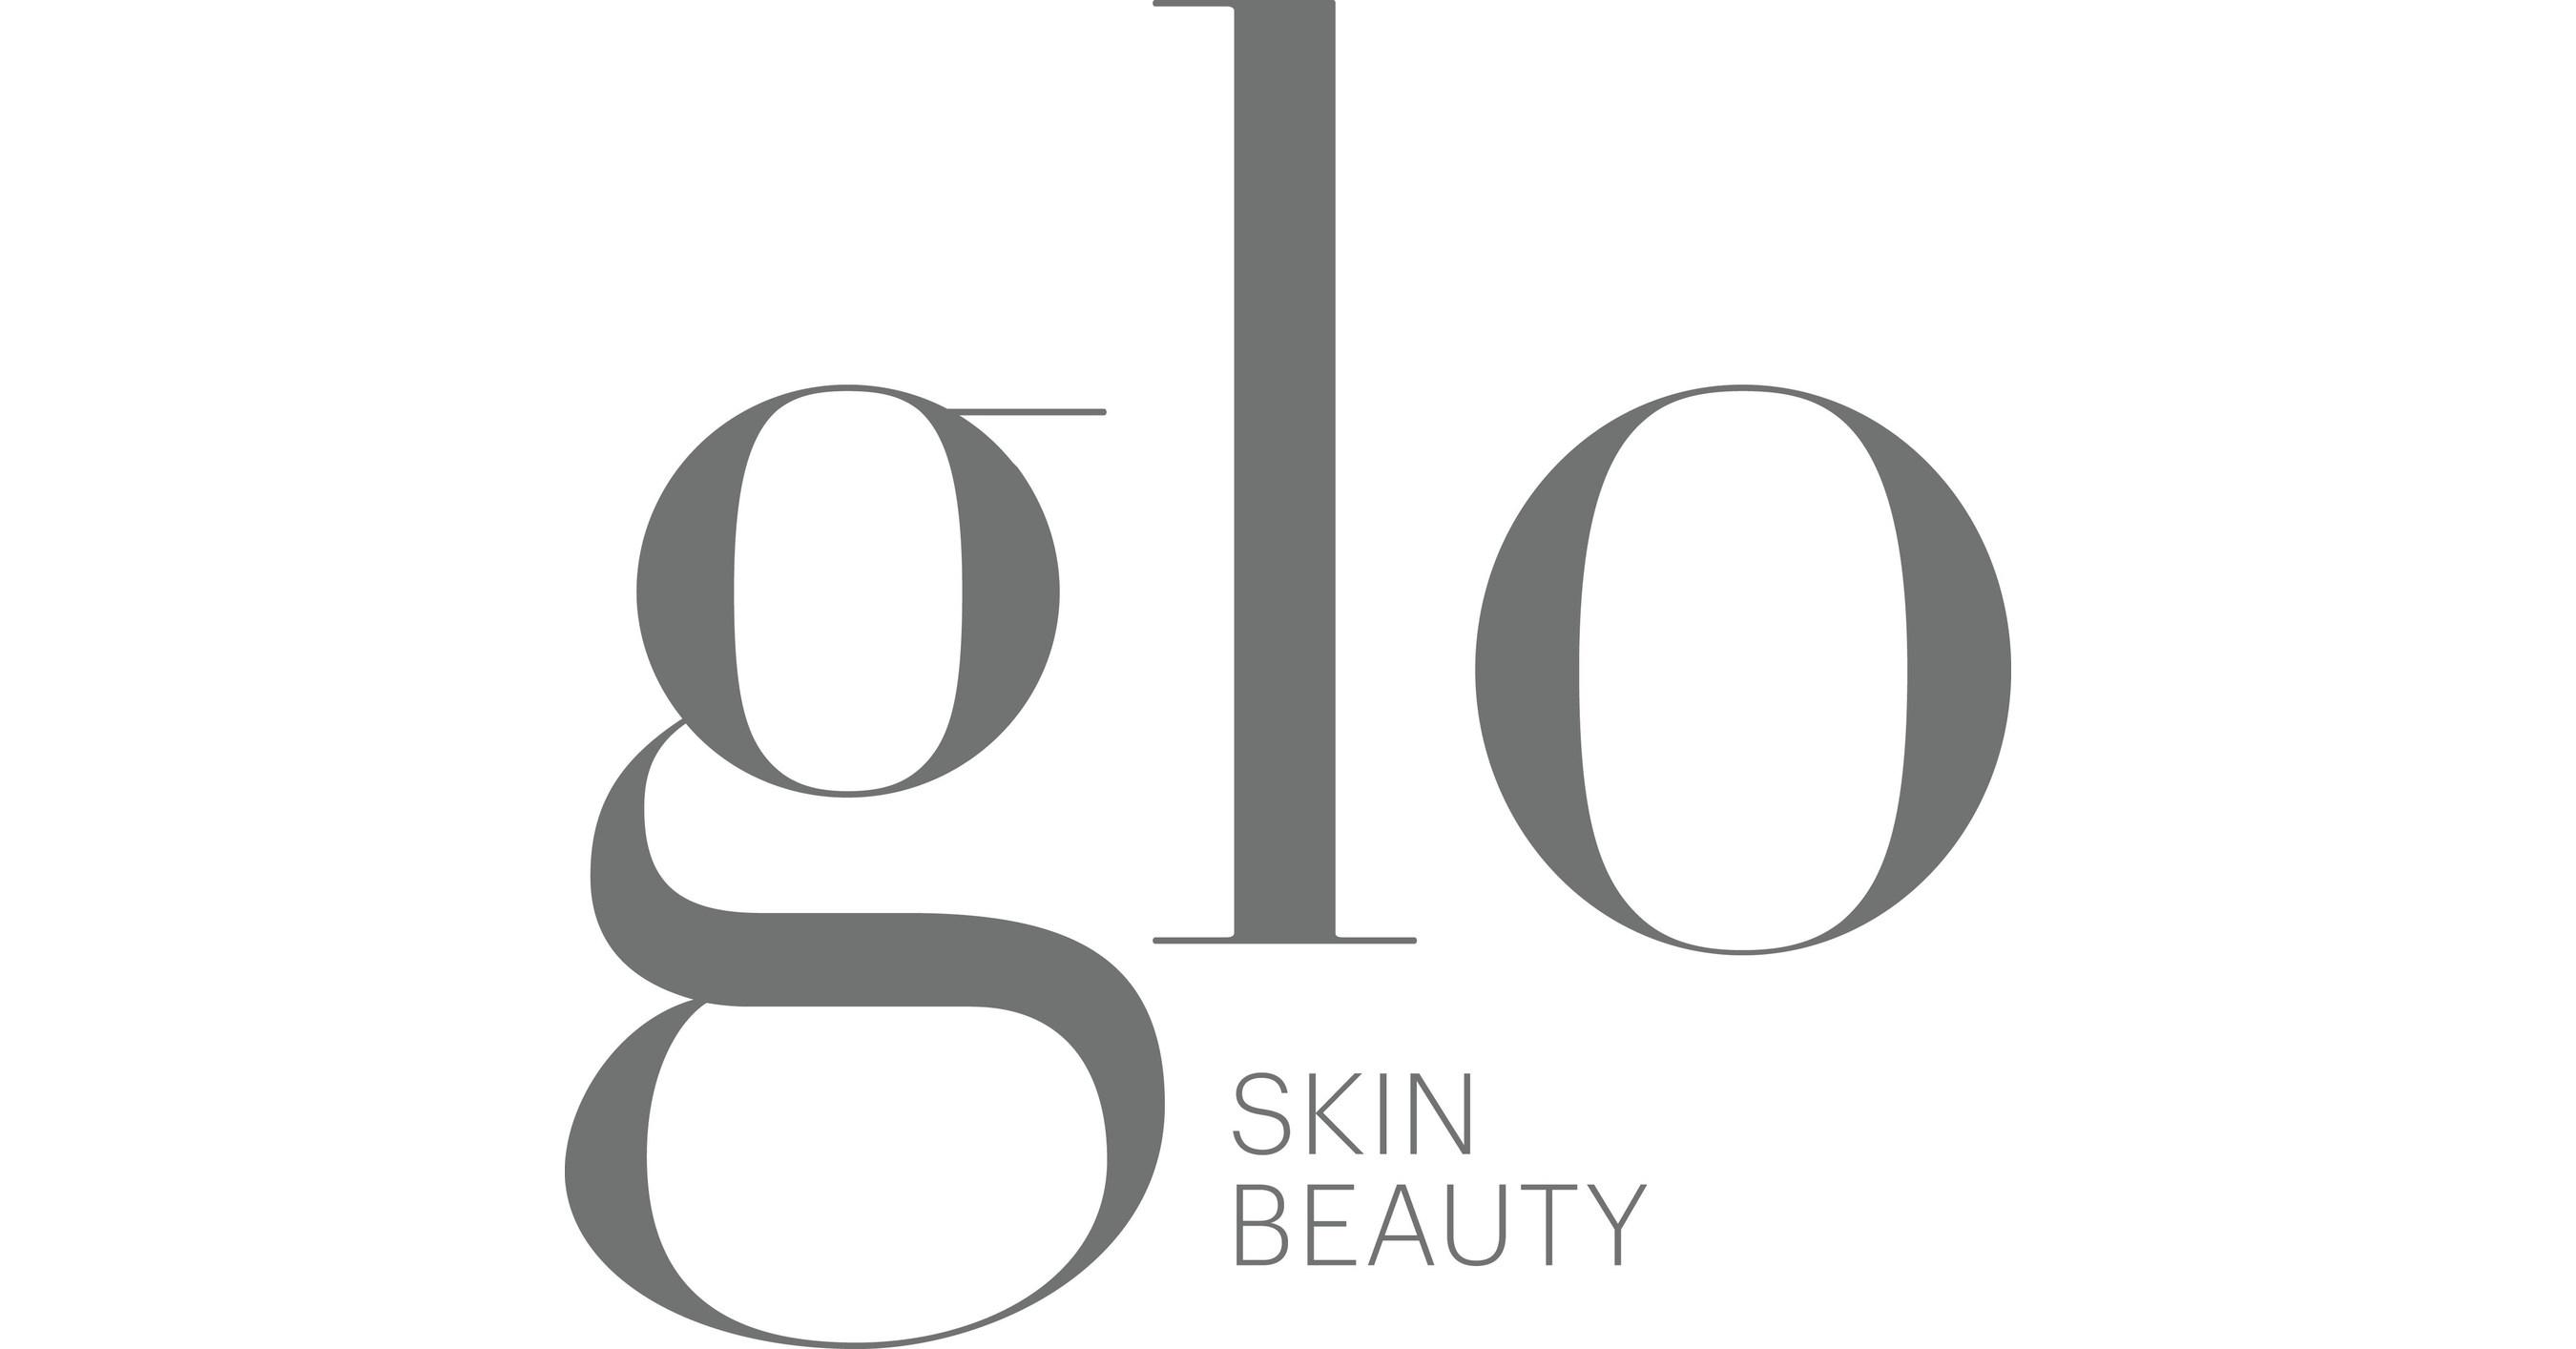 Gloprofessional Rebrands To Glo Skin Beauty